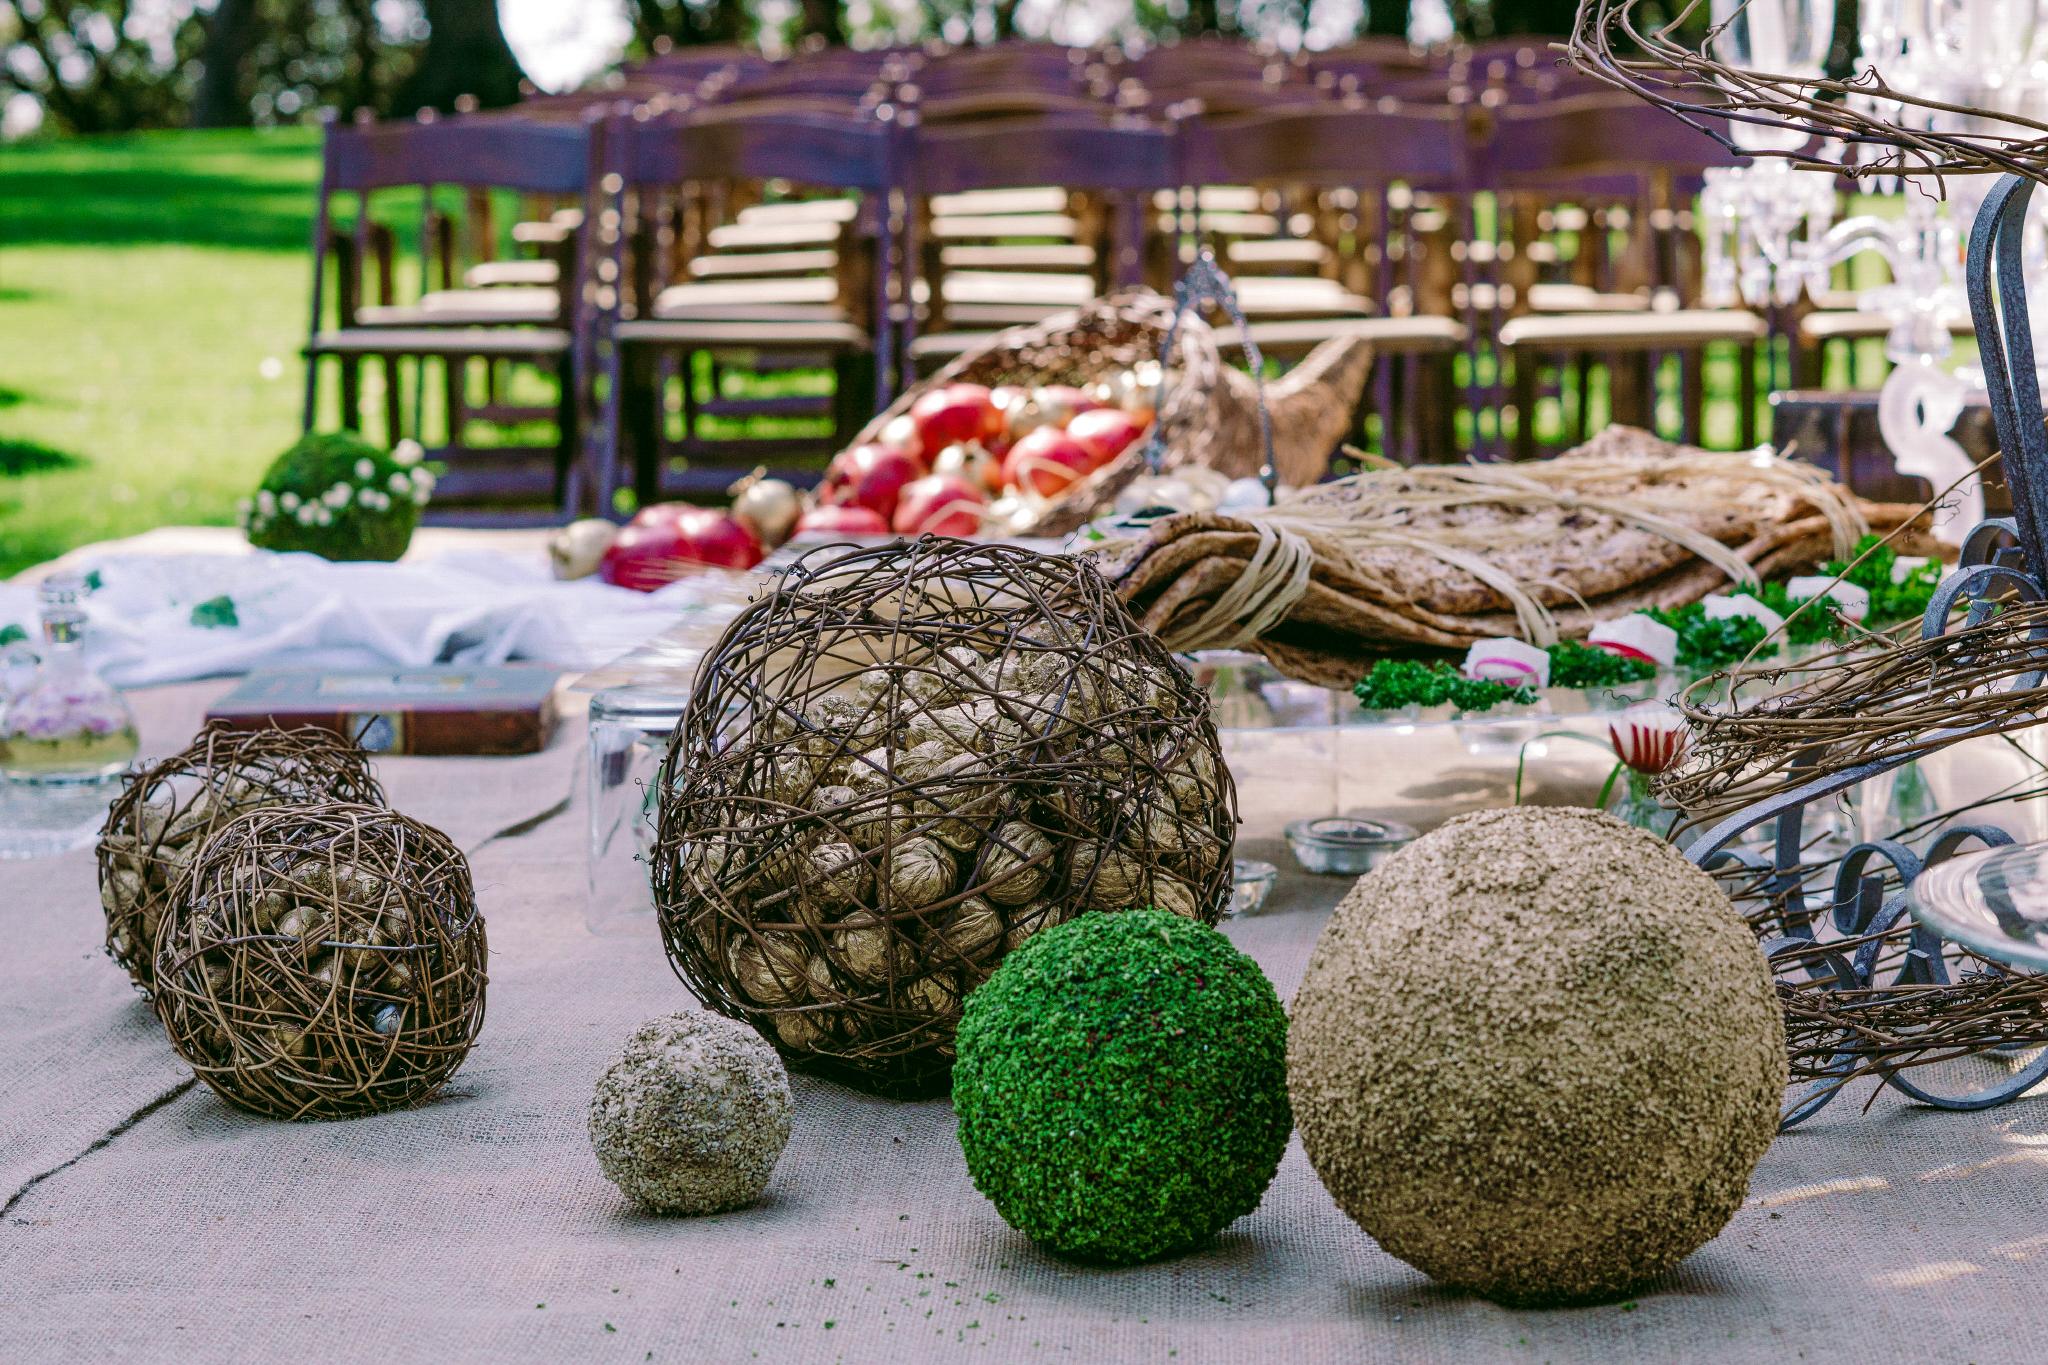 san diego wedding   photographer | balls of twine wrapped around seeds